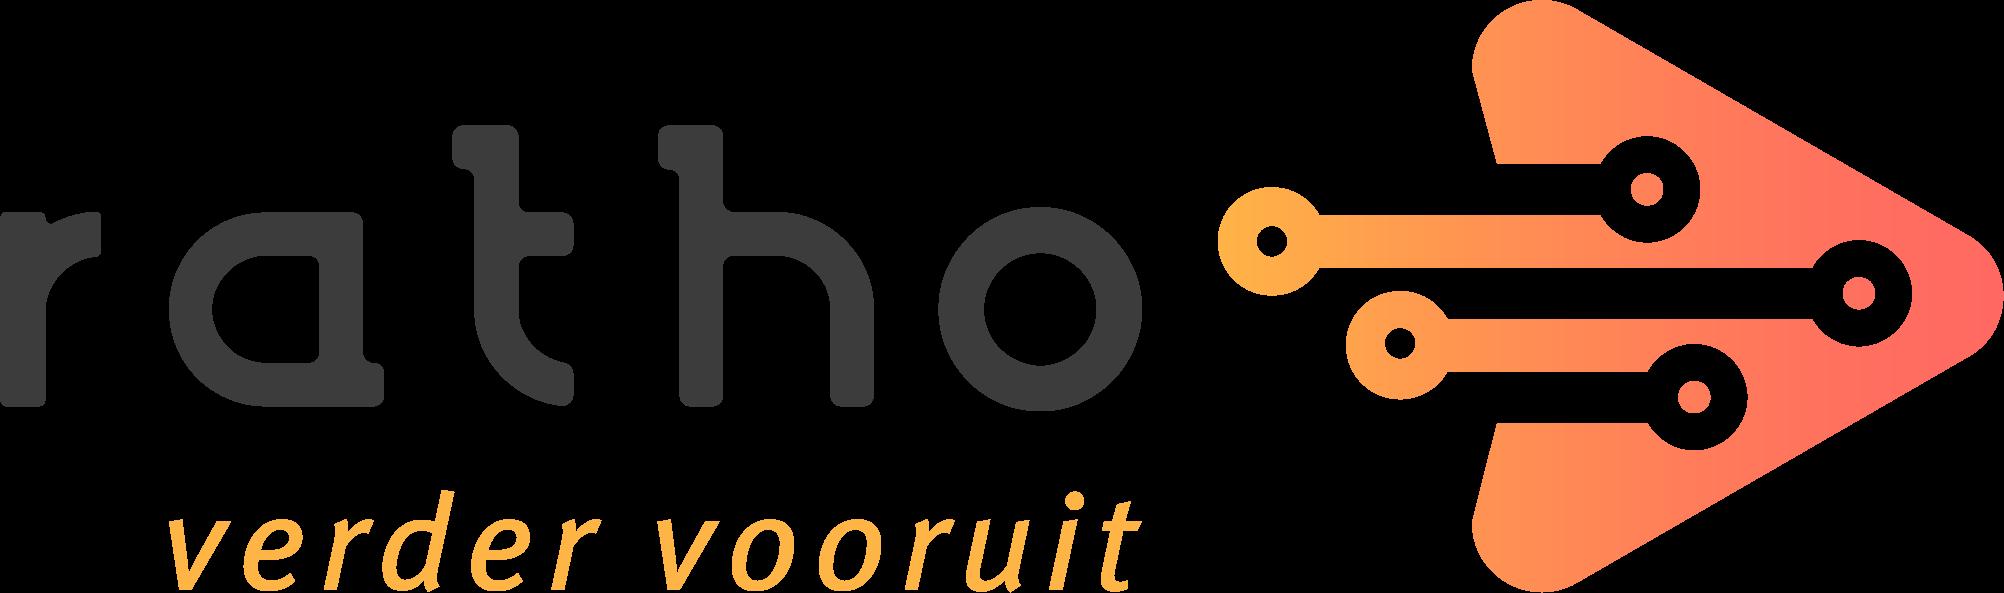 Ratho logo RGB (png)